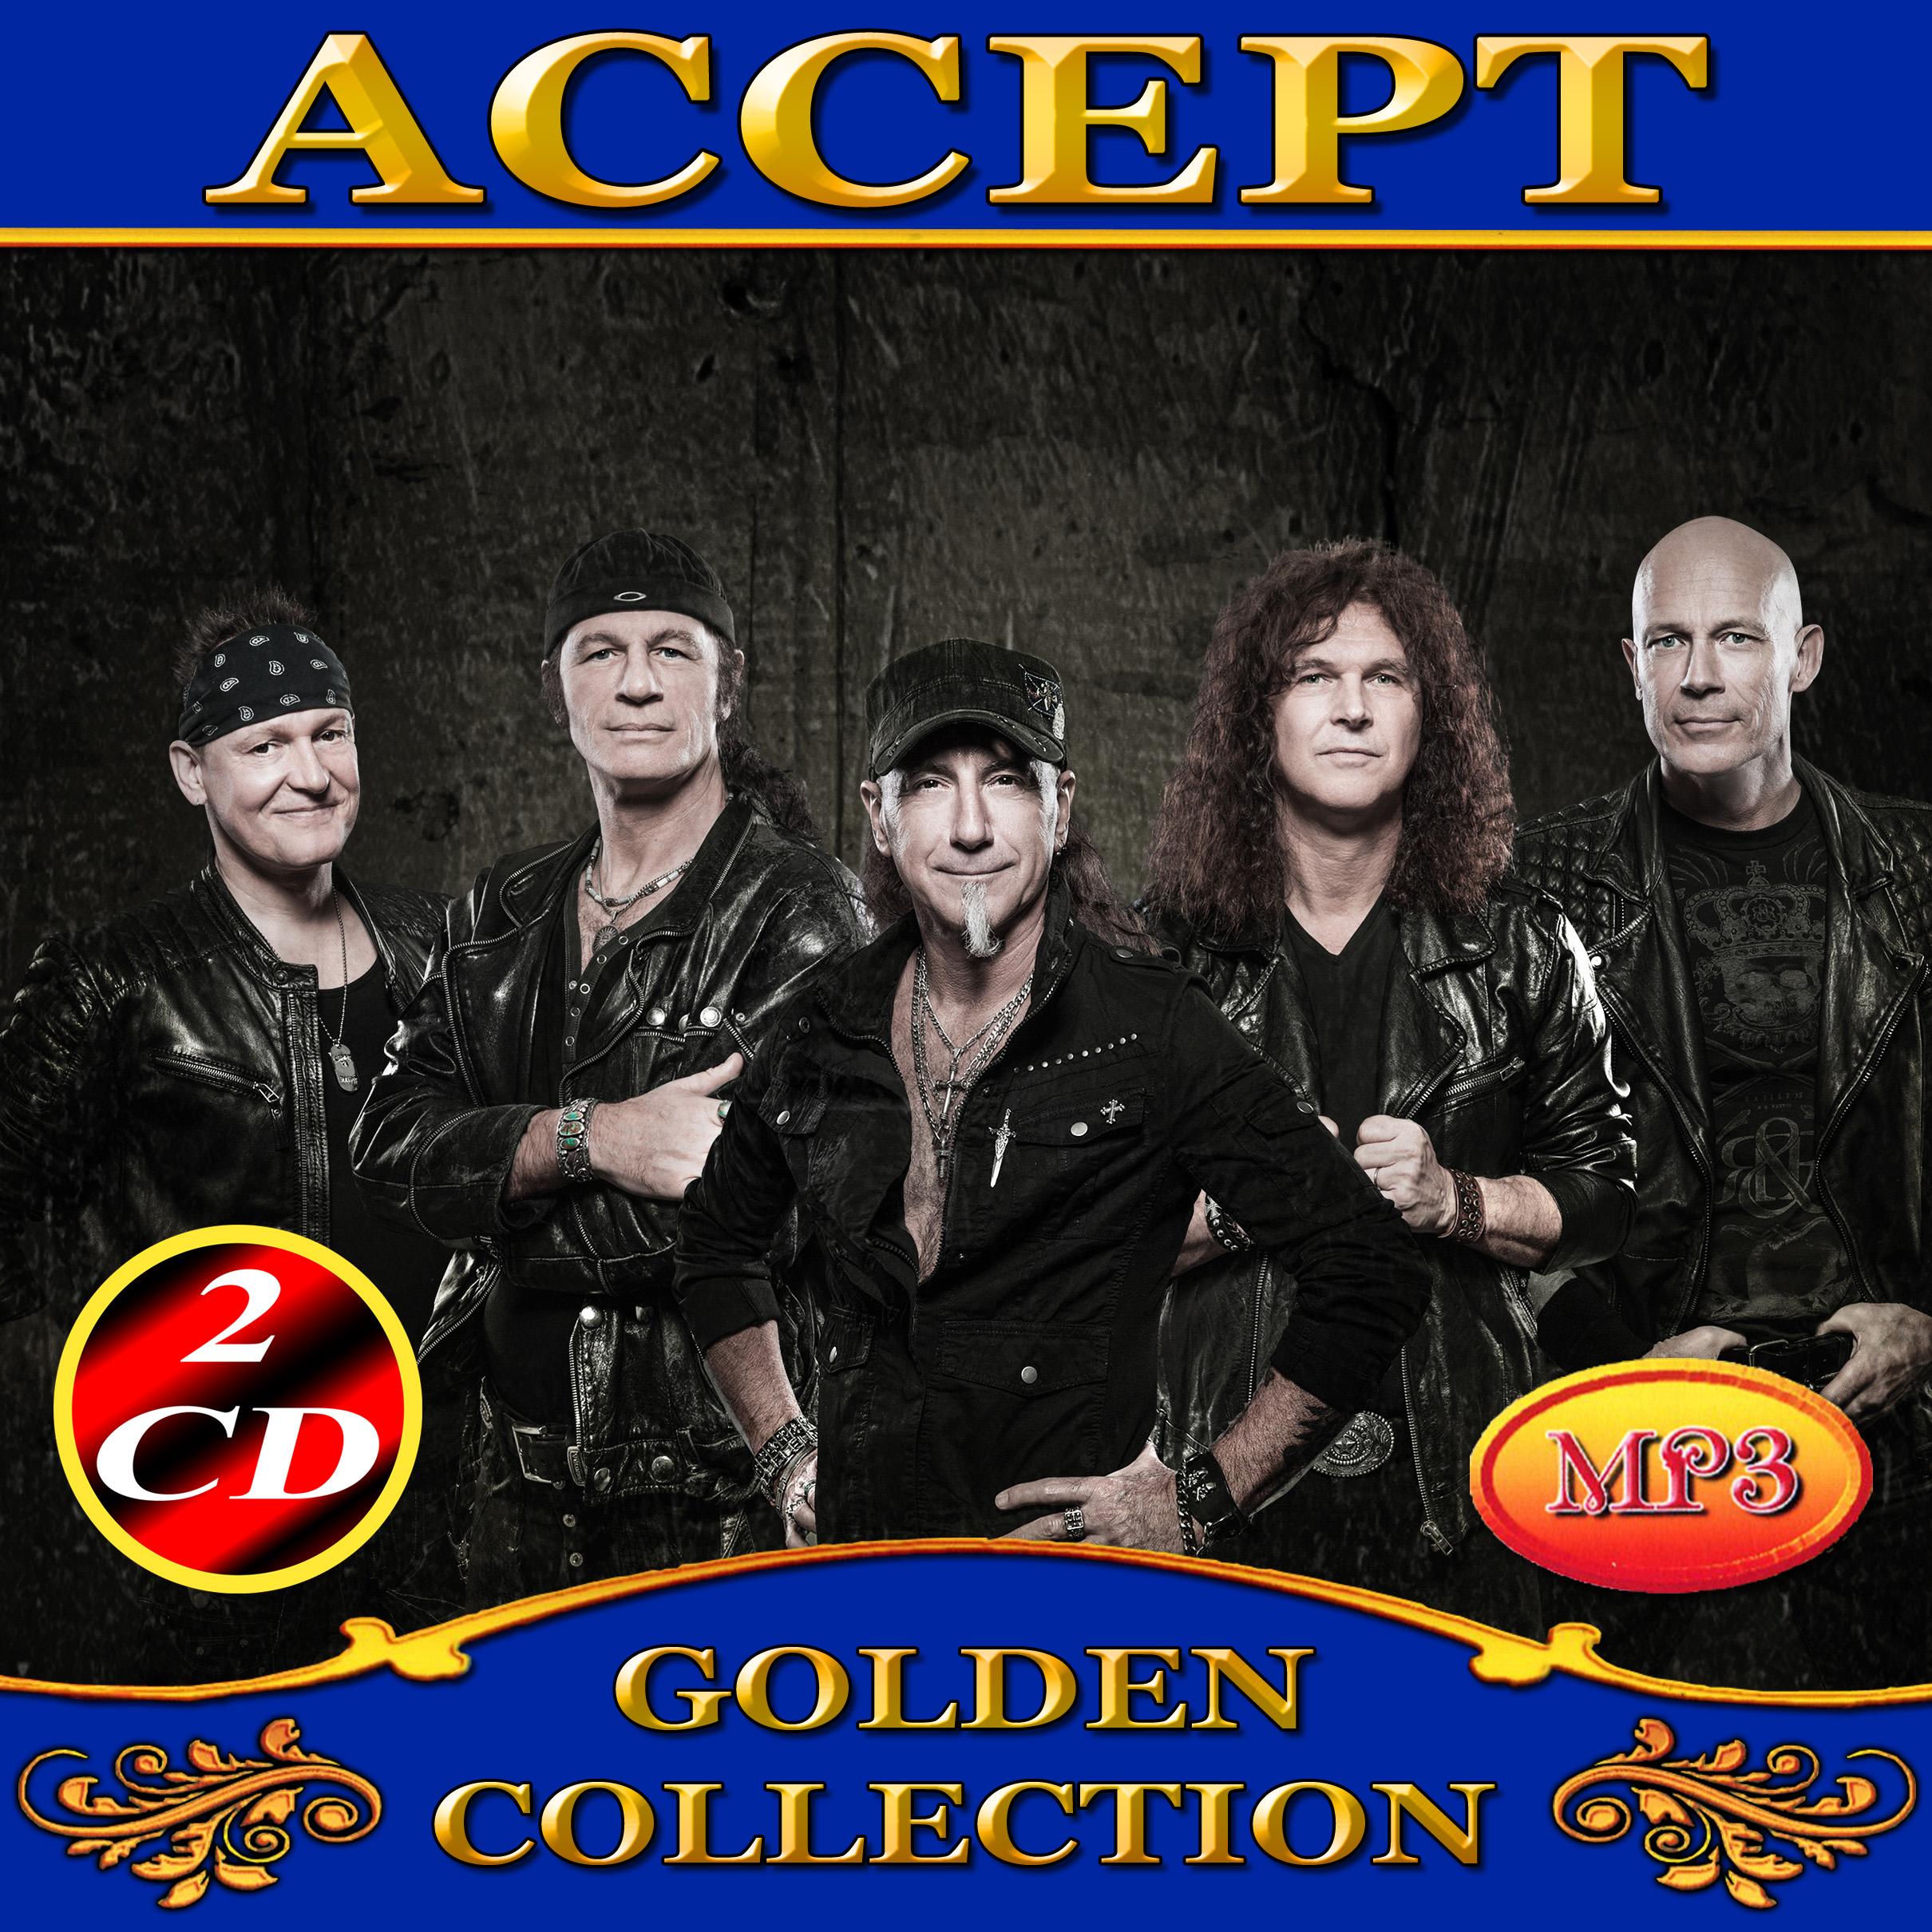 Accept 2cd [mp3]